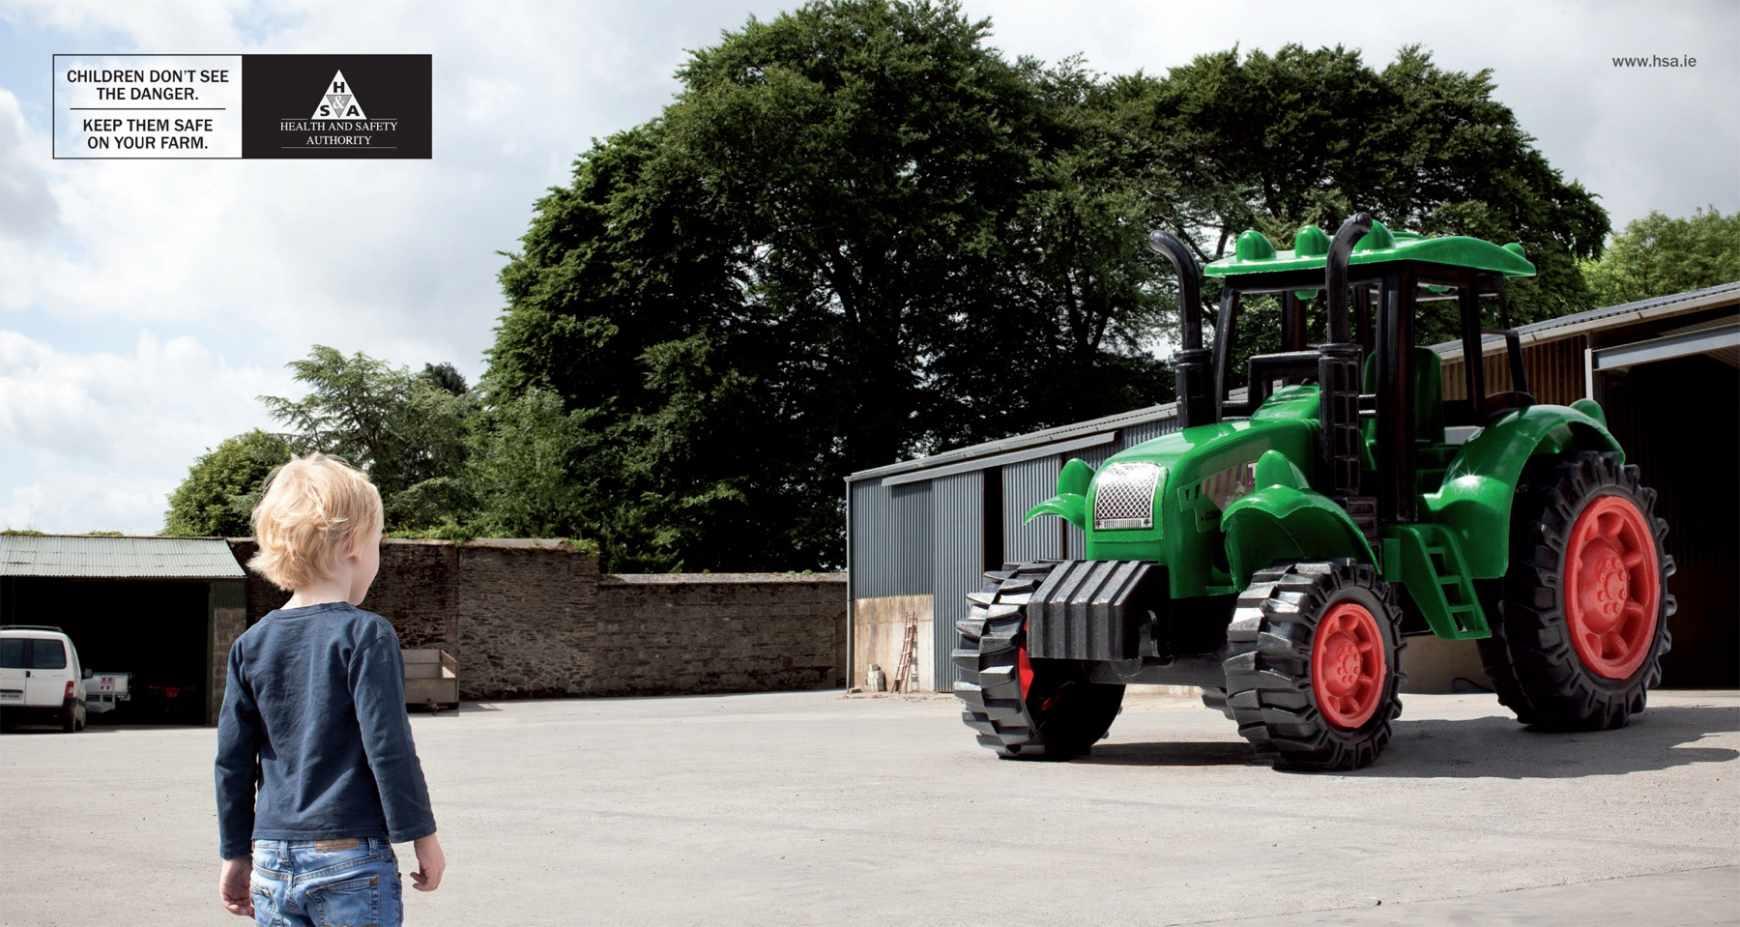 hsa_farm_safety_tractor_press_aotw